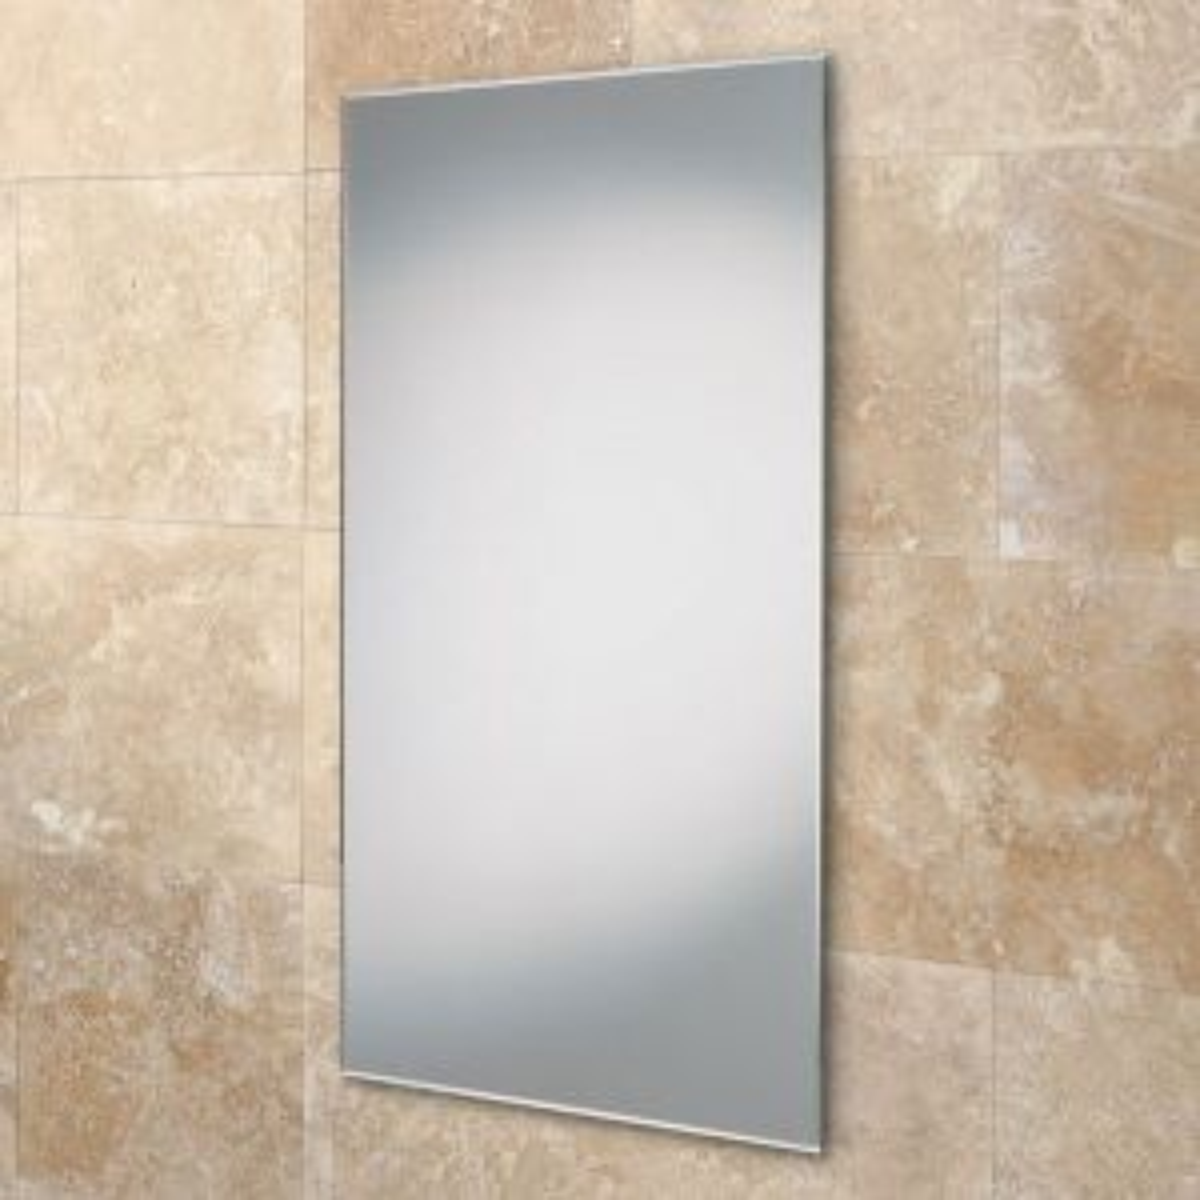 HiB Fili Bathroom Mirror